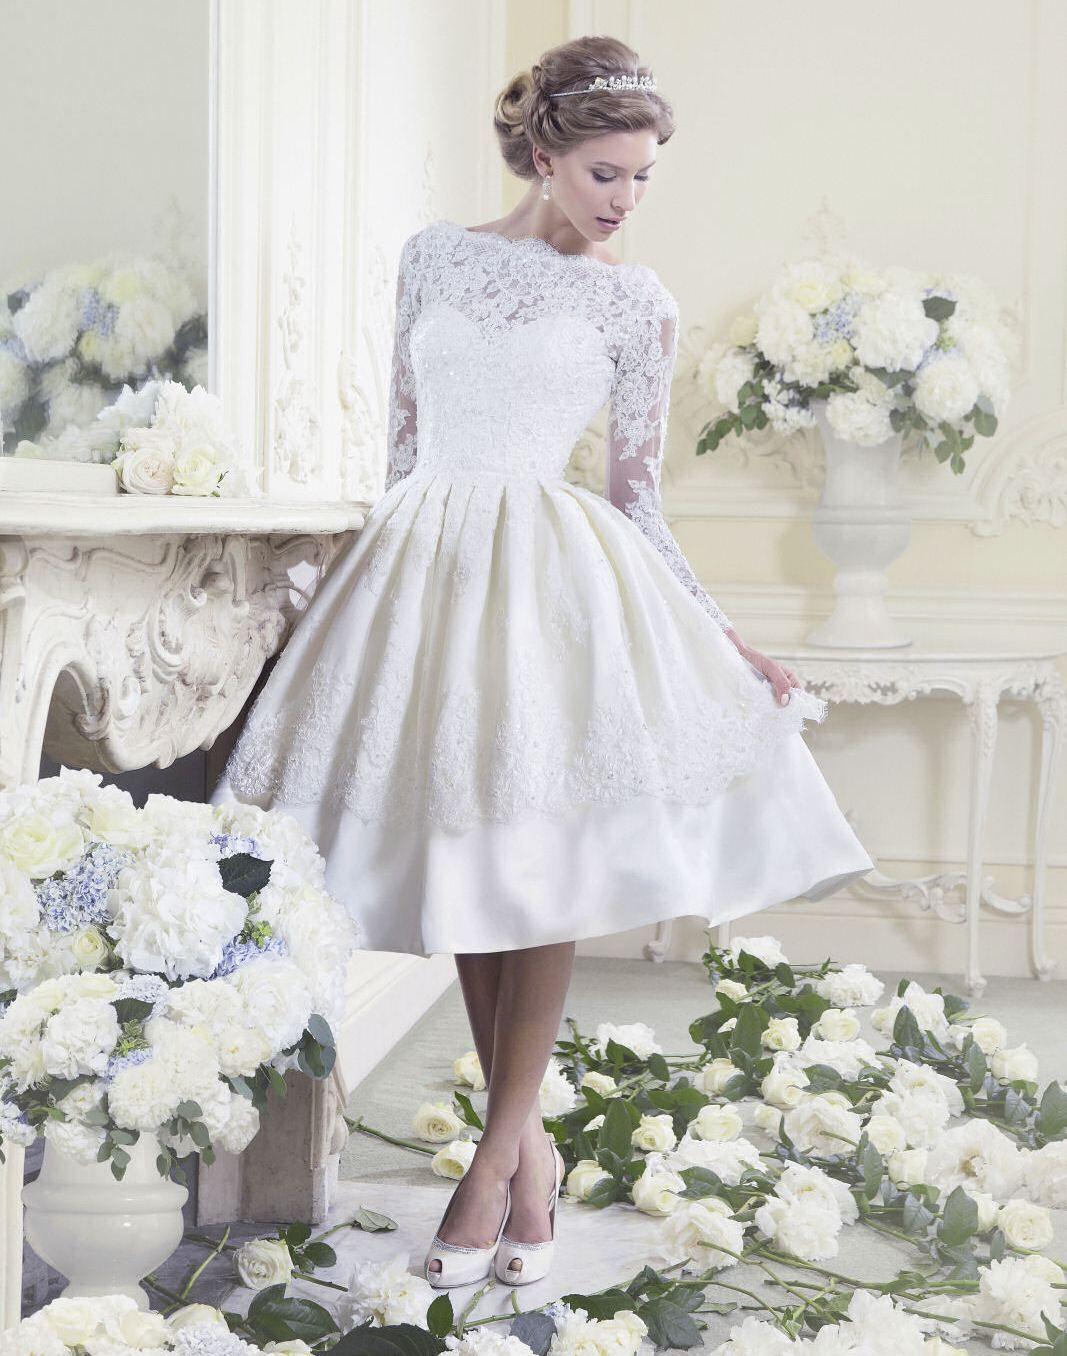 e76108b0368f74c Свадебное платье миди: средняя длина до и ниже колена | невеста ...